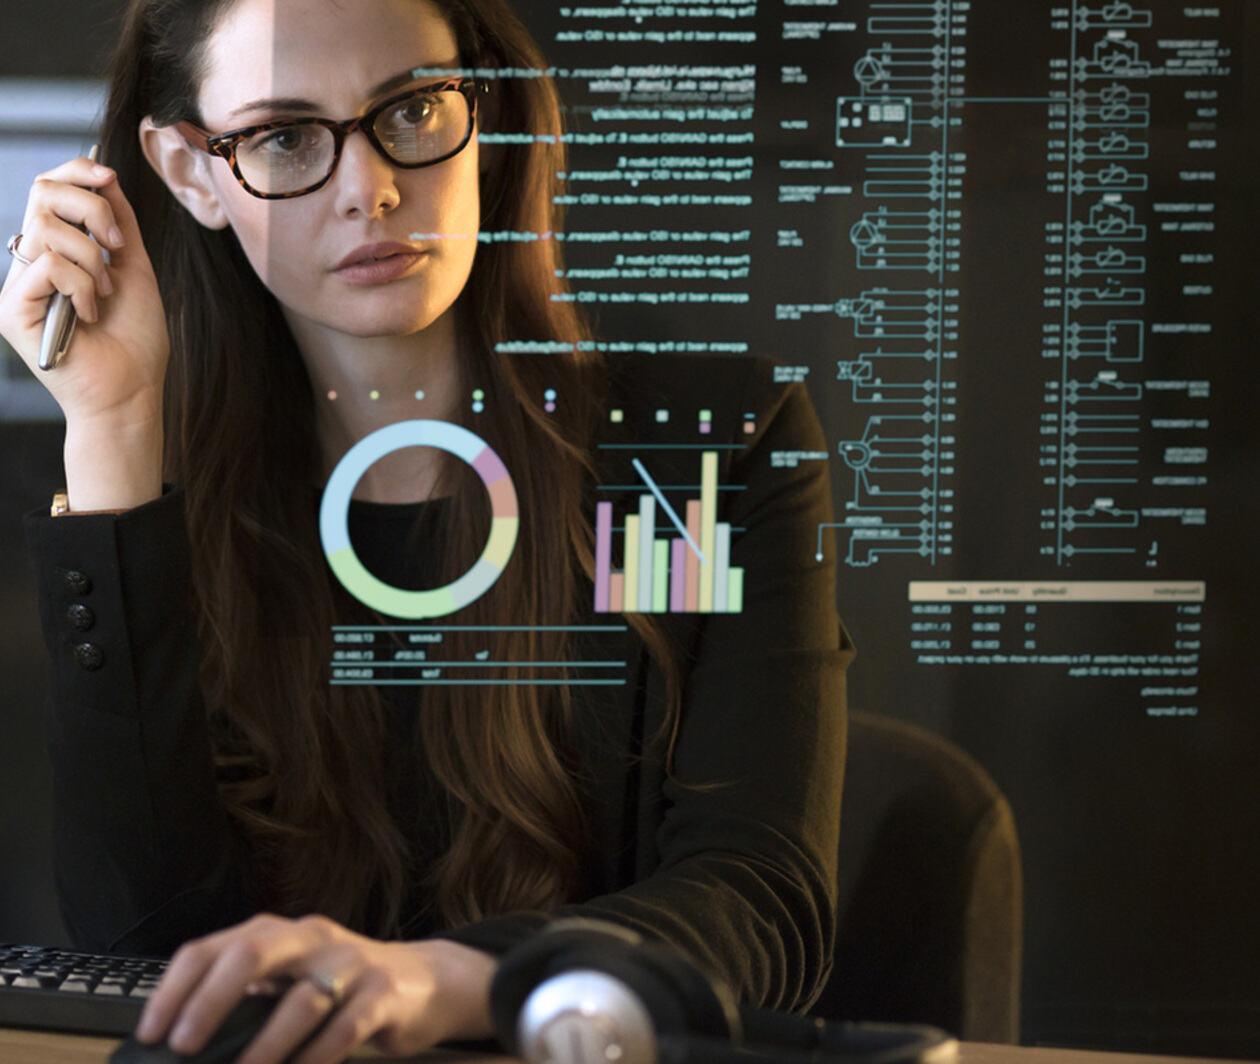 Microsoft Future Ready: Data Science Research Methods Using Python Programming